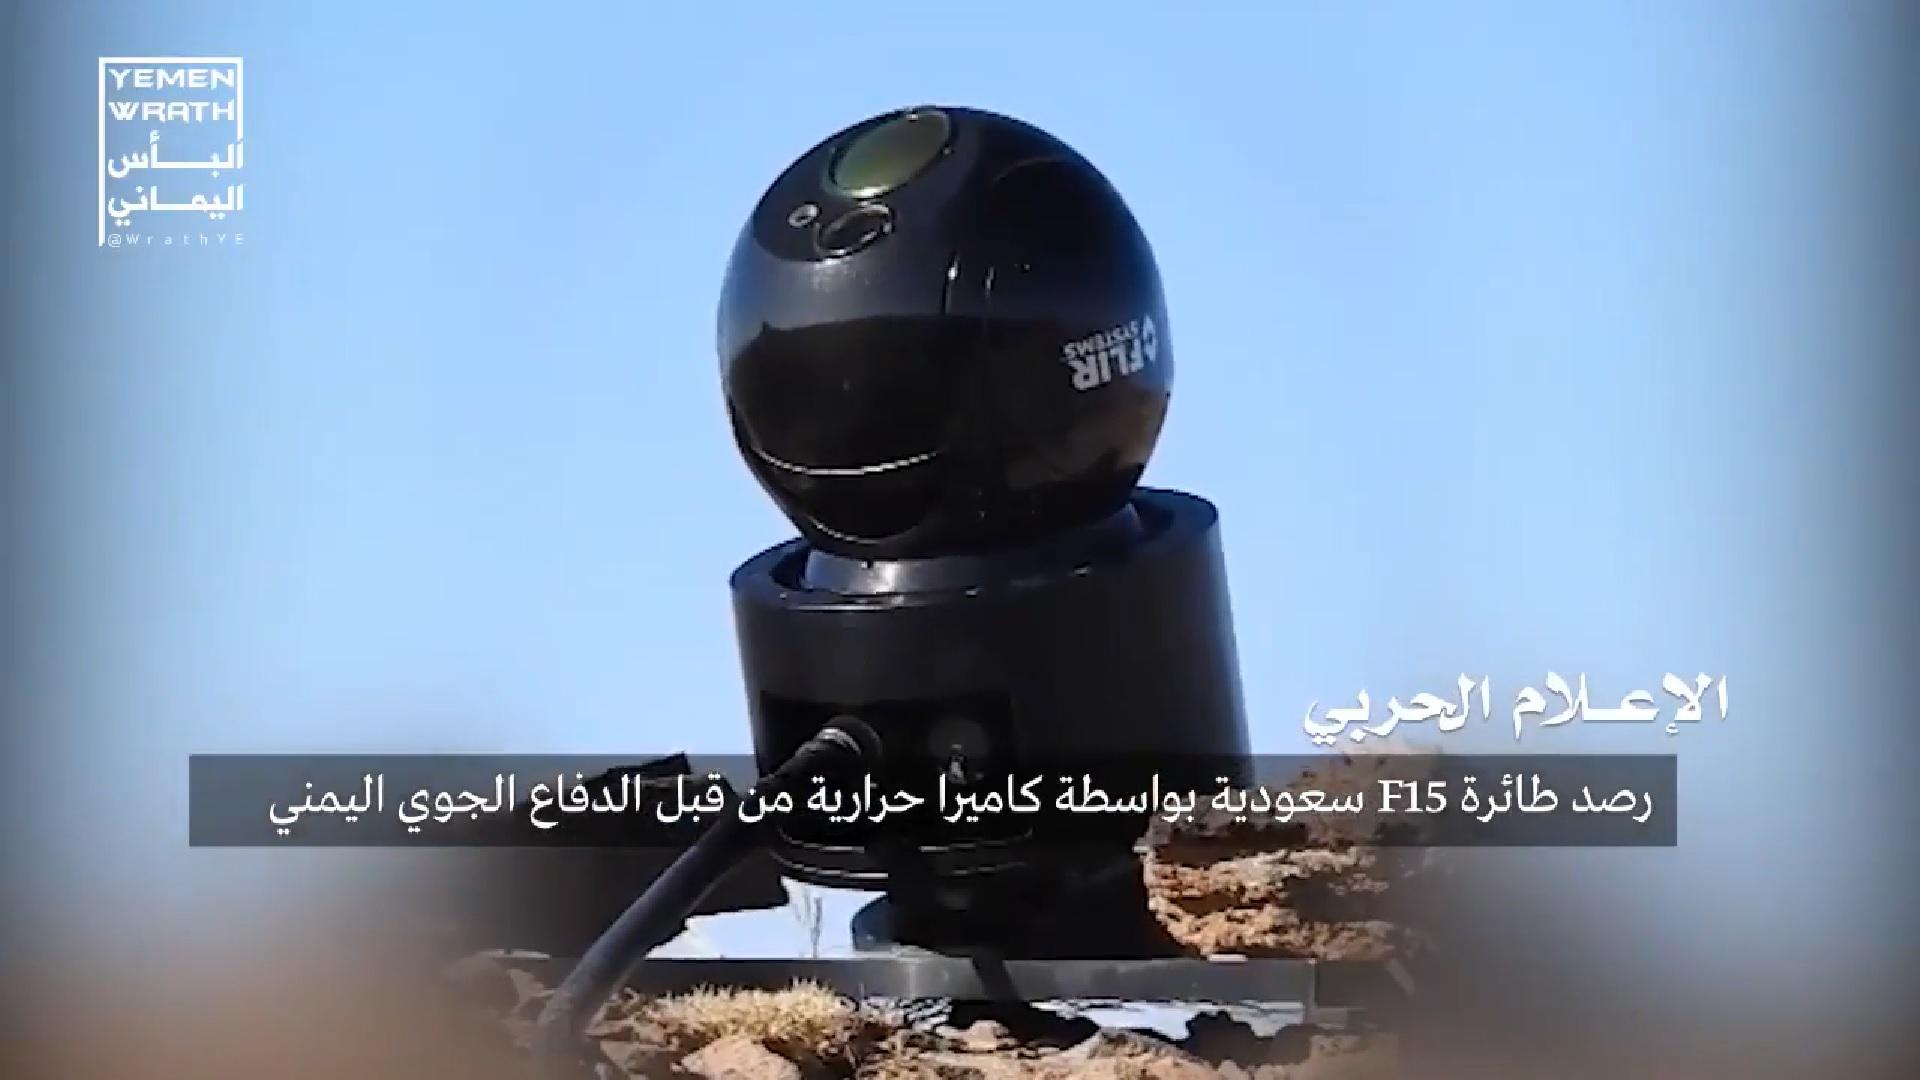 Houthis Vydanie Video MQ-1 Drone Byť Shot nad Sanaa